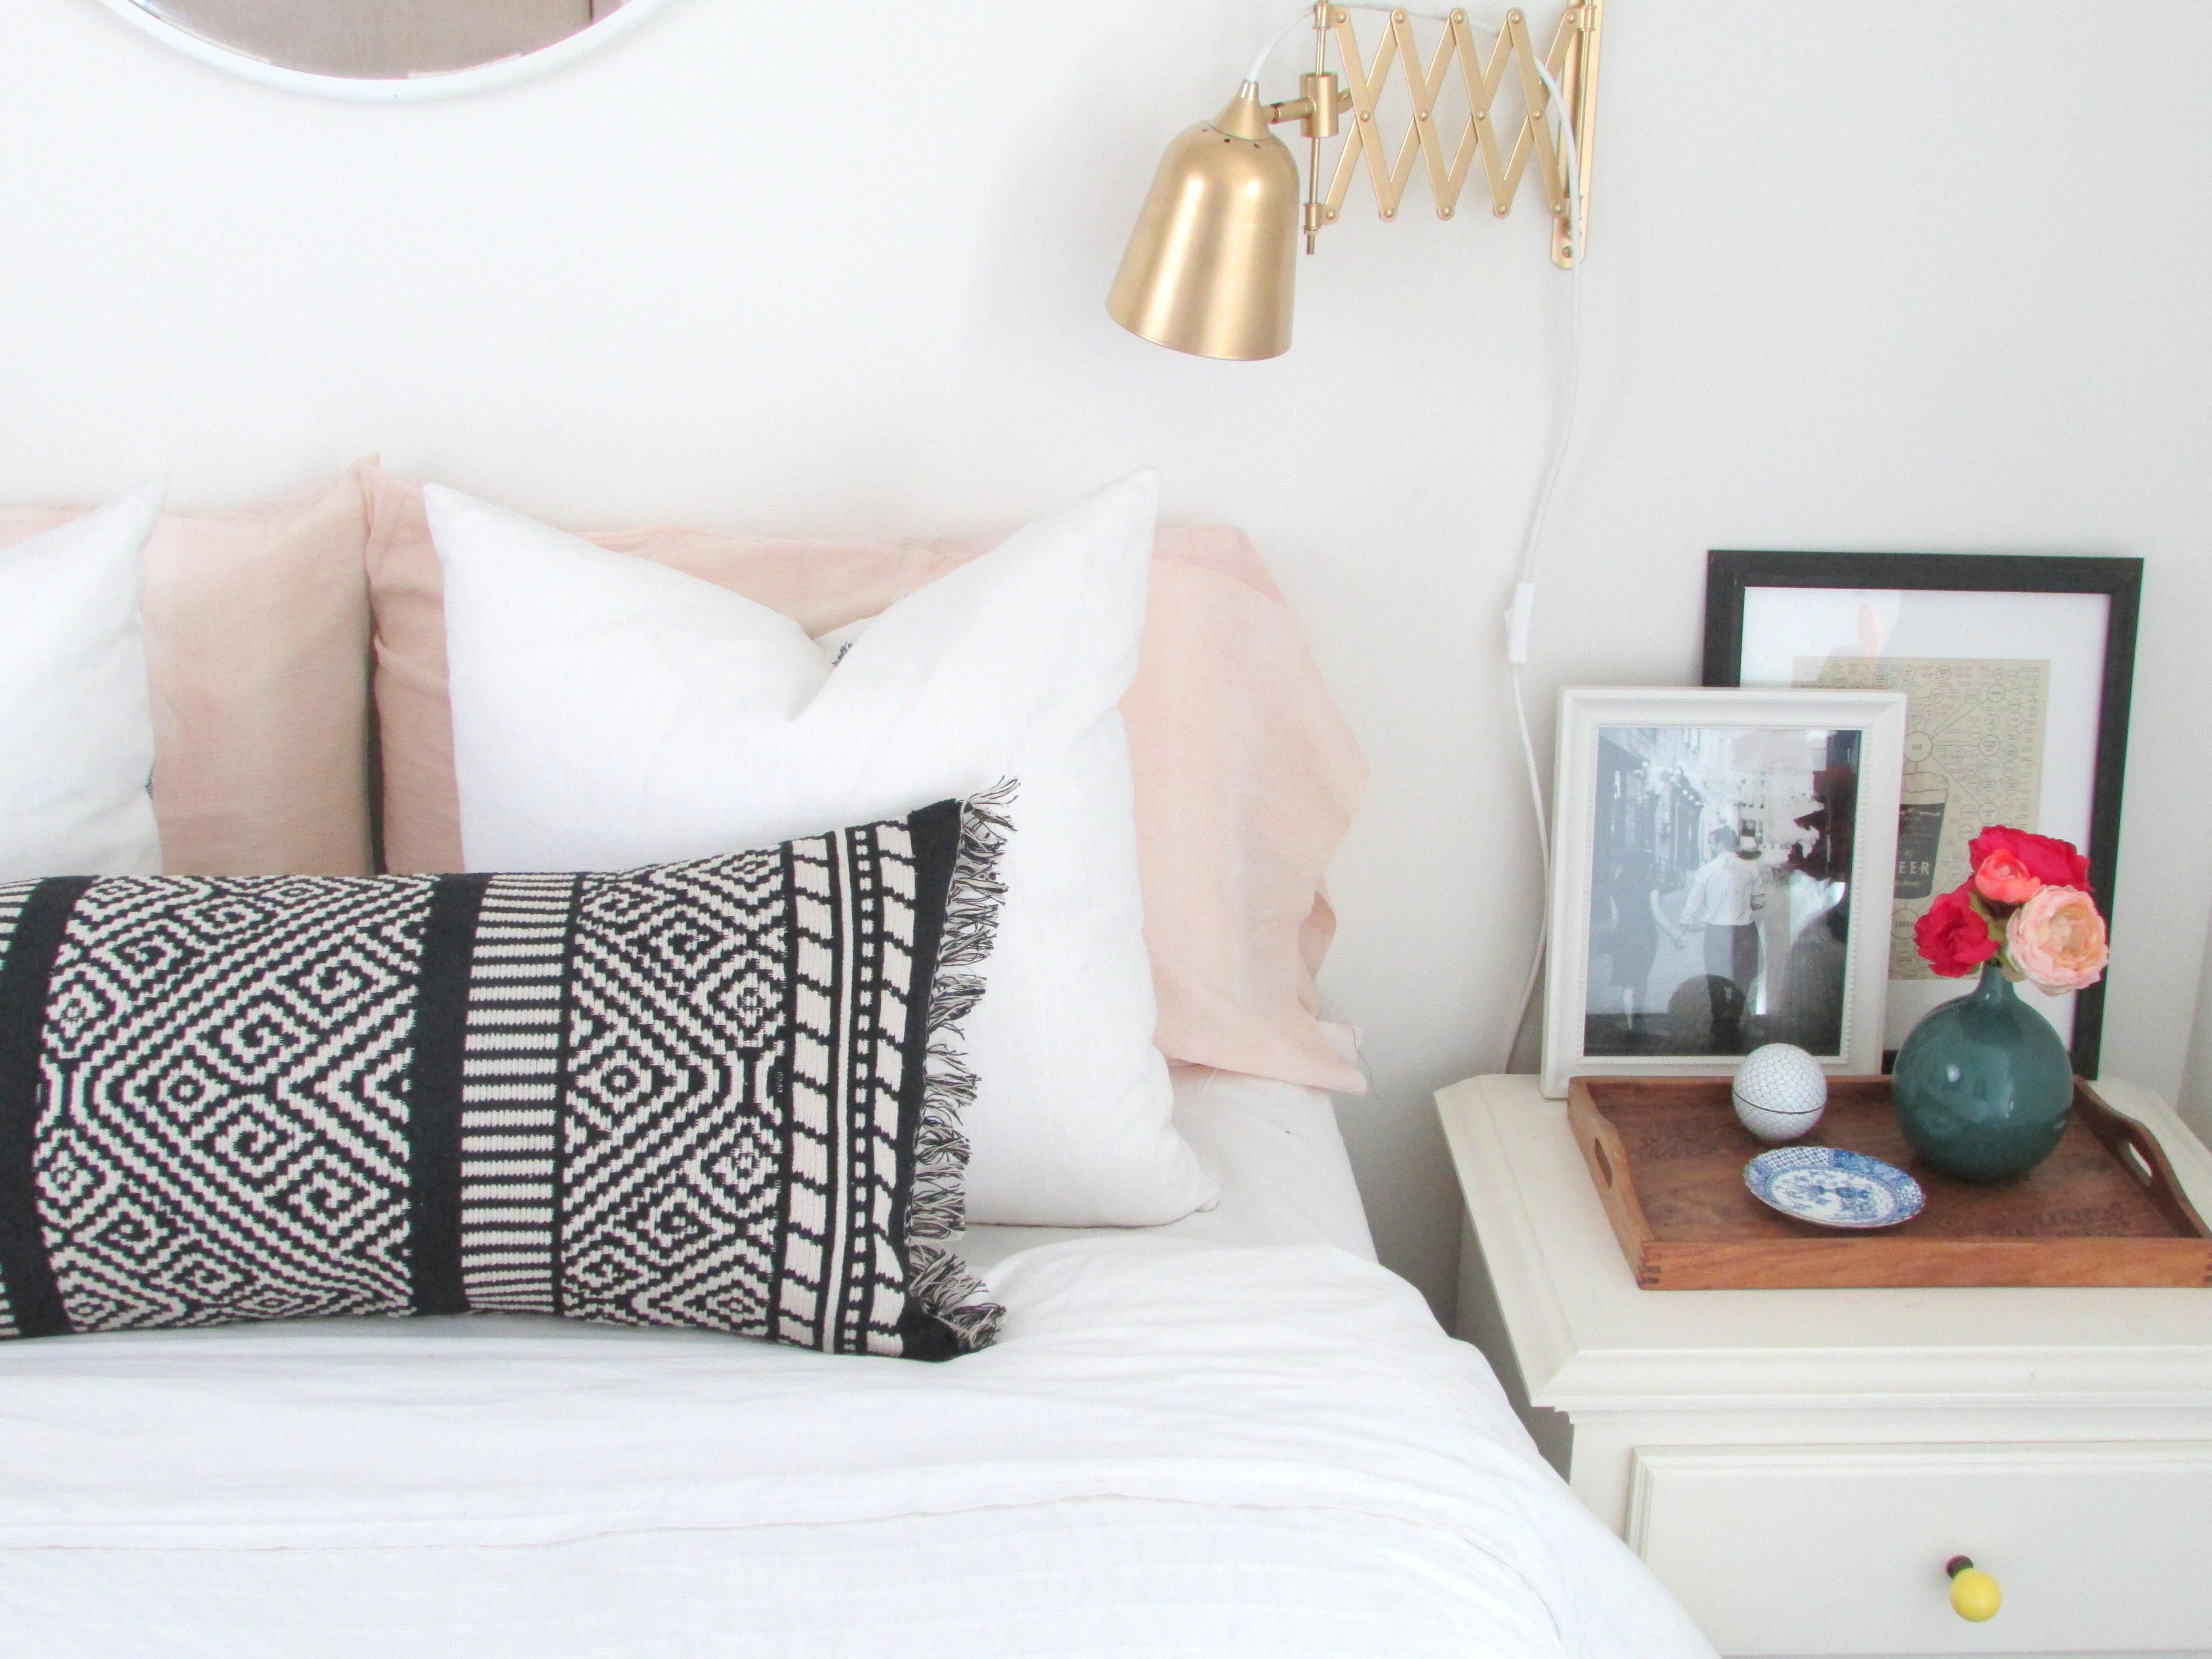 Make a Boho Lumbar Pillow from a Table Runner Francois et Moi